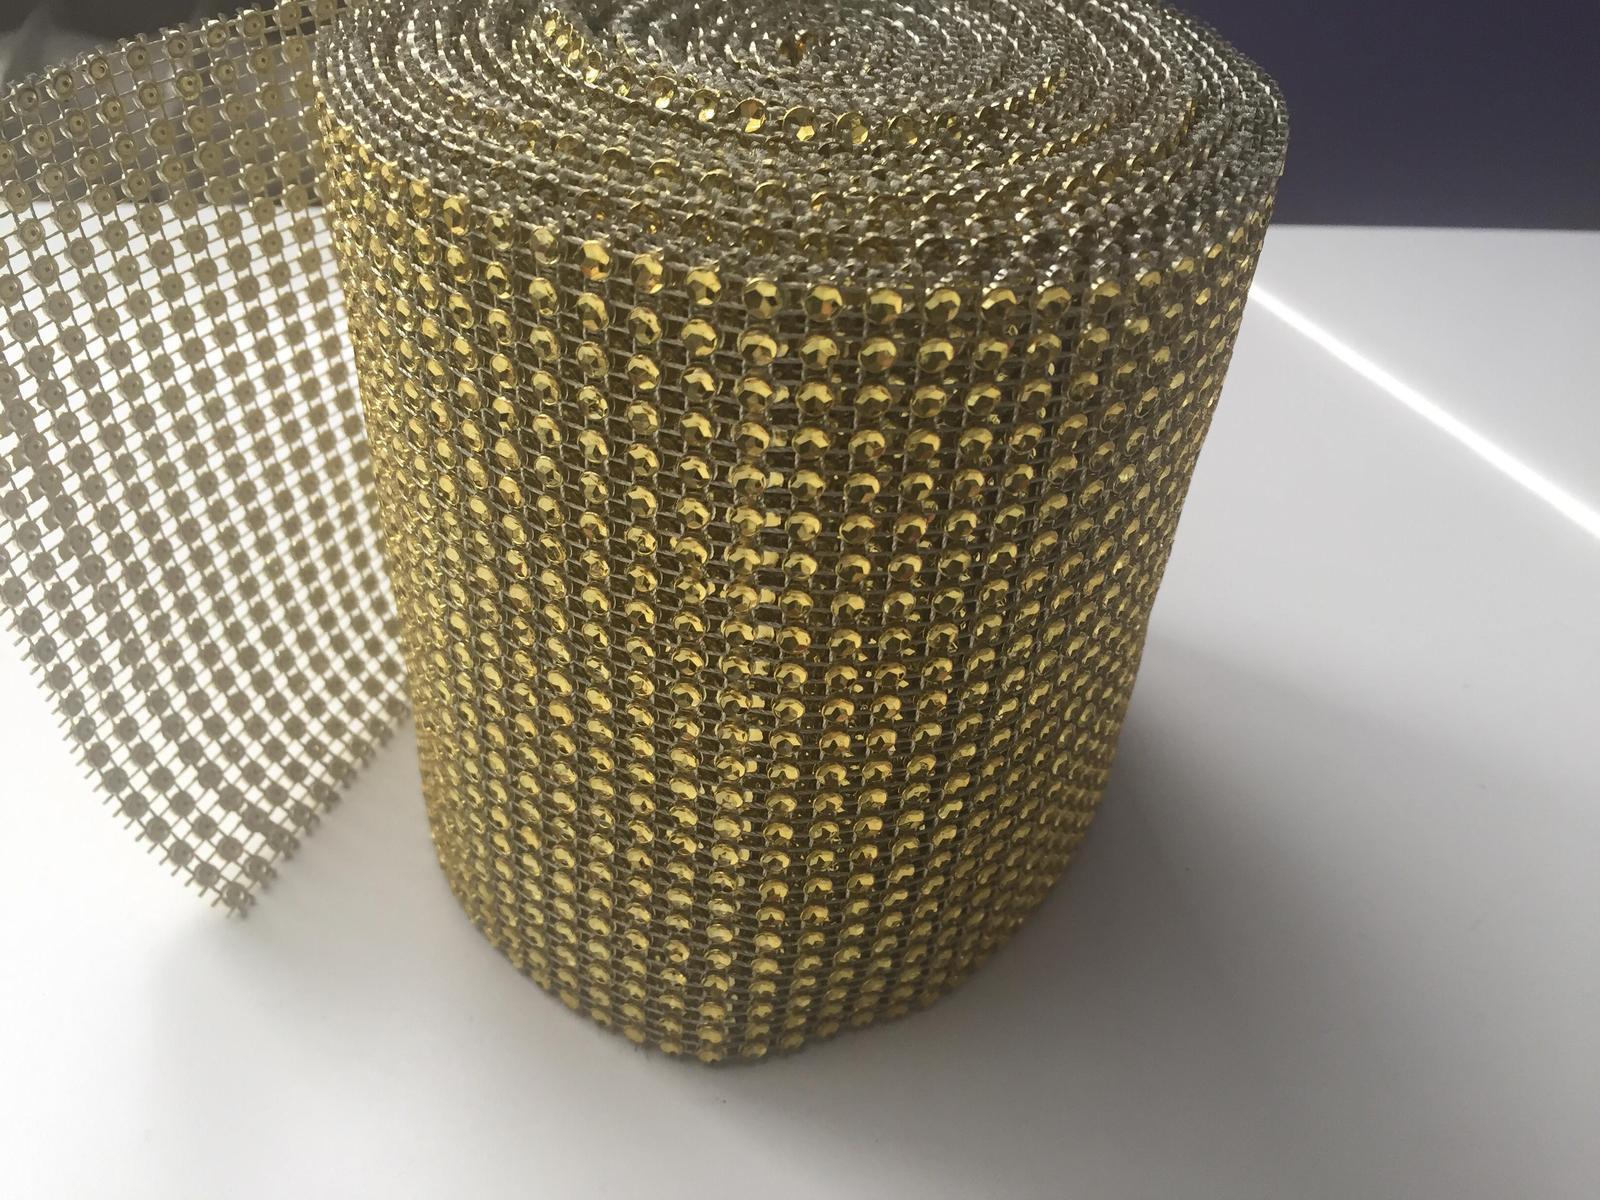 Zlata strasova stola na stol  - Obrázok č. 3